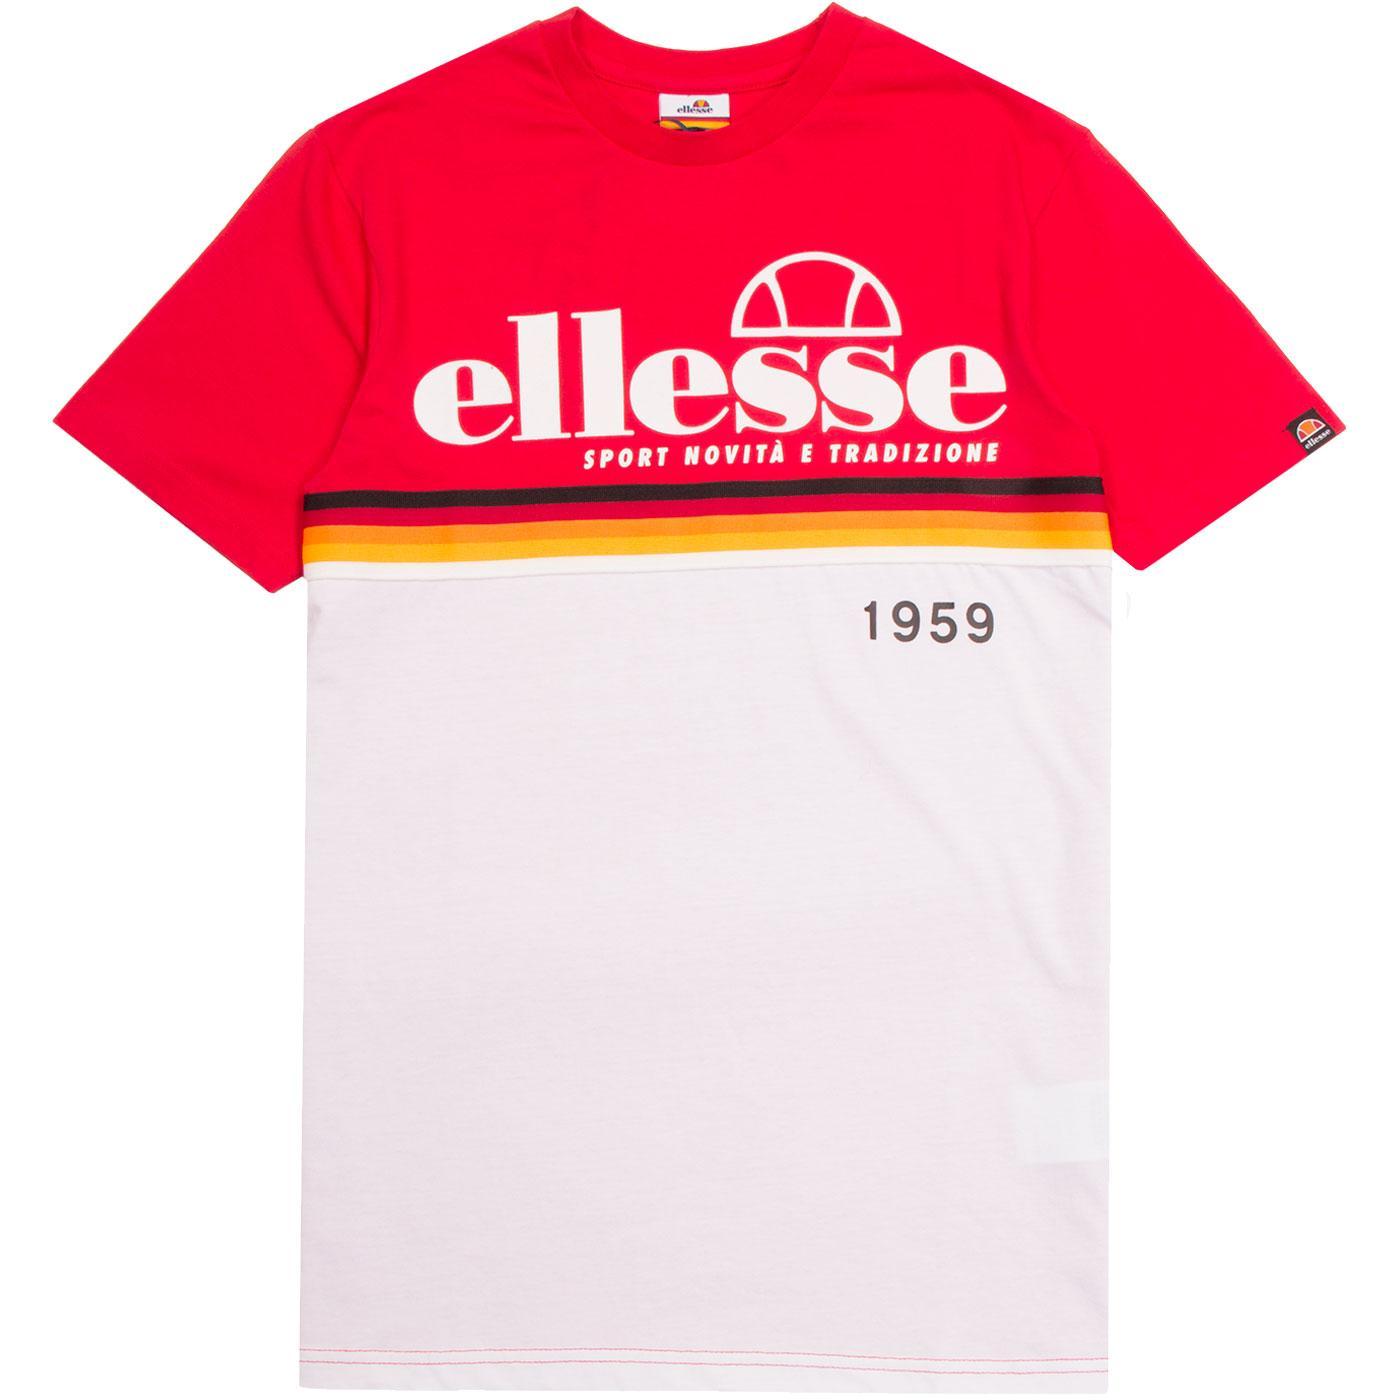 Brescia ELLESSE Retro Indie Sports Heritage Tee R